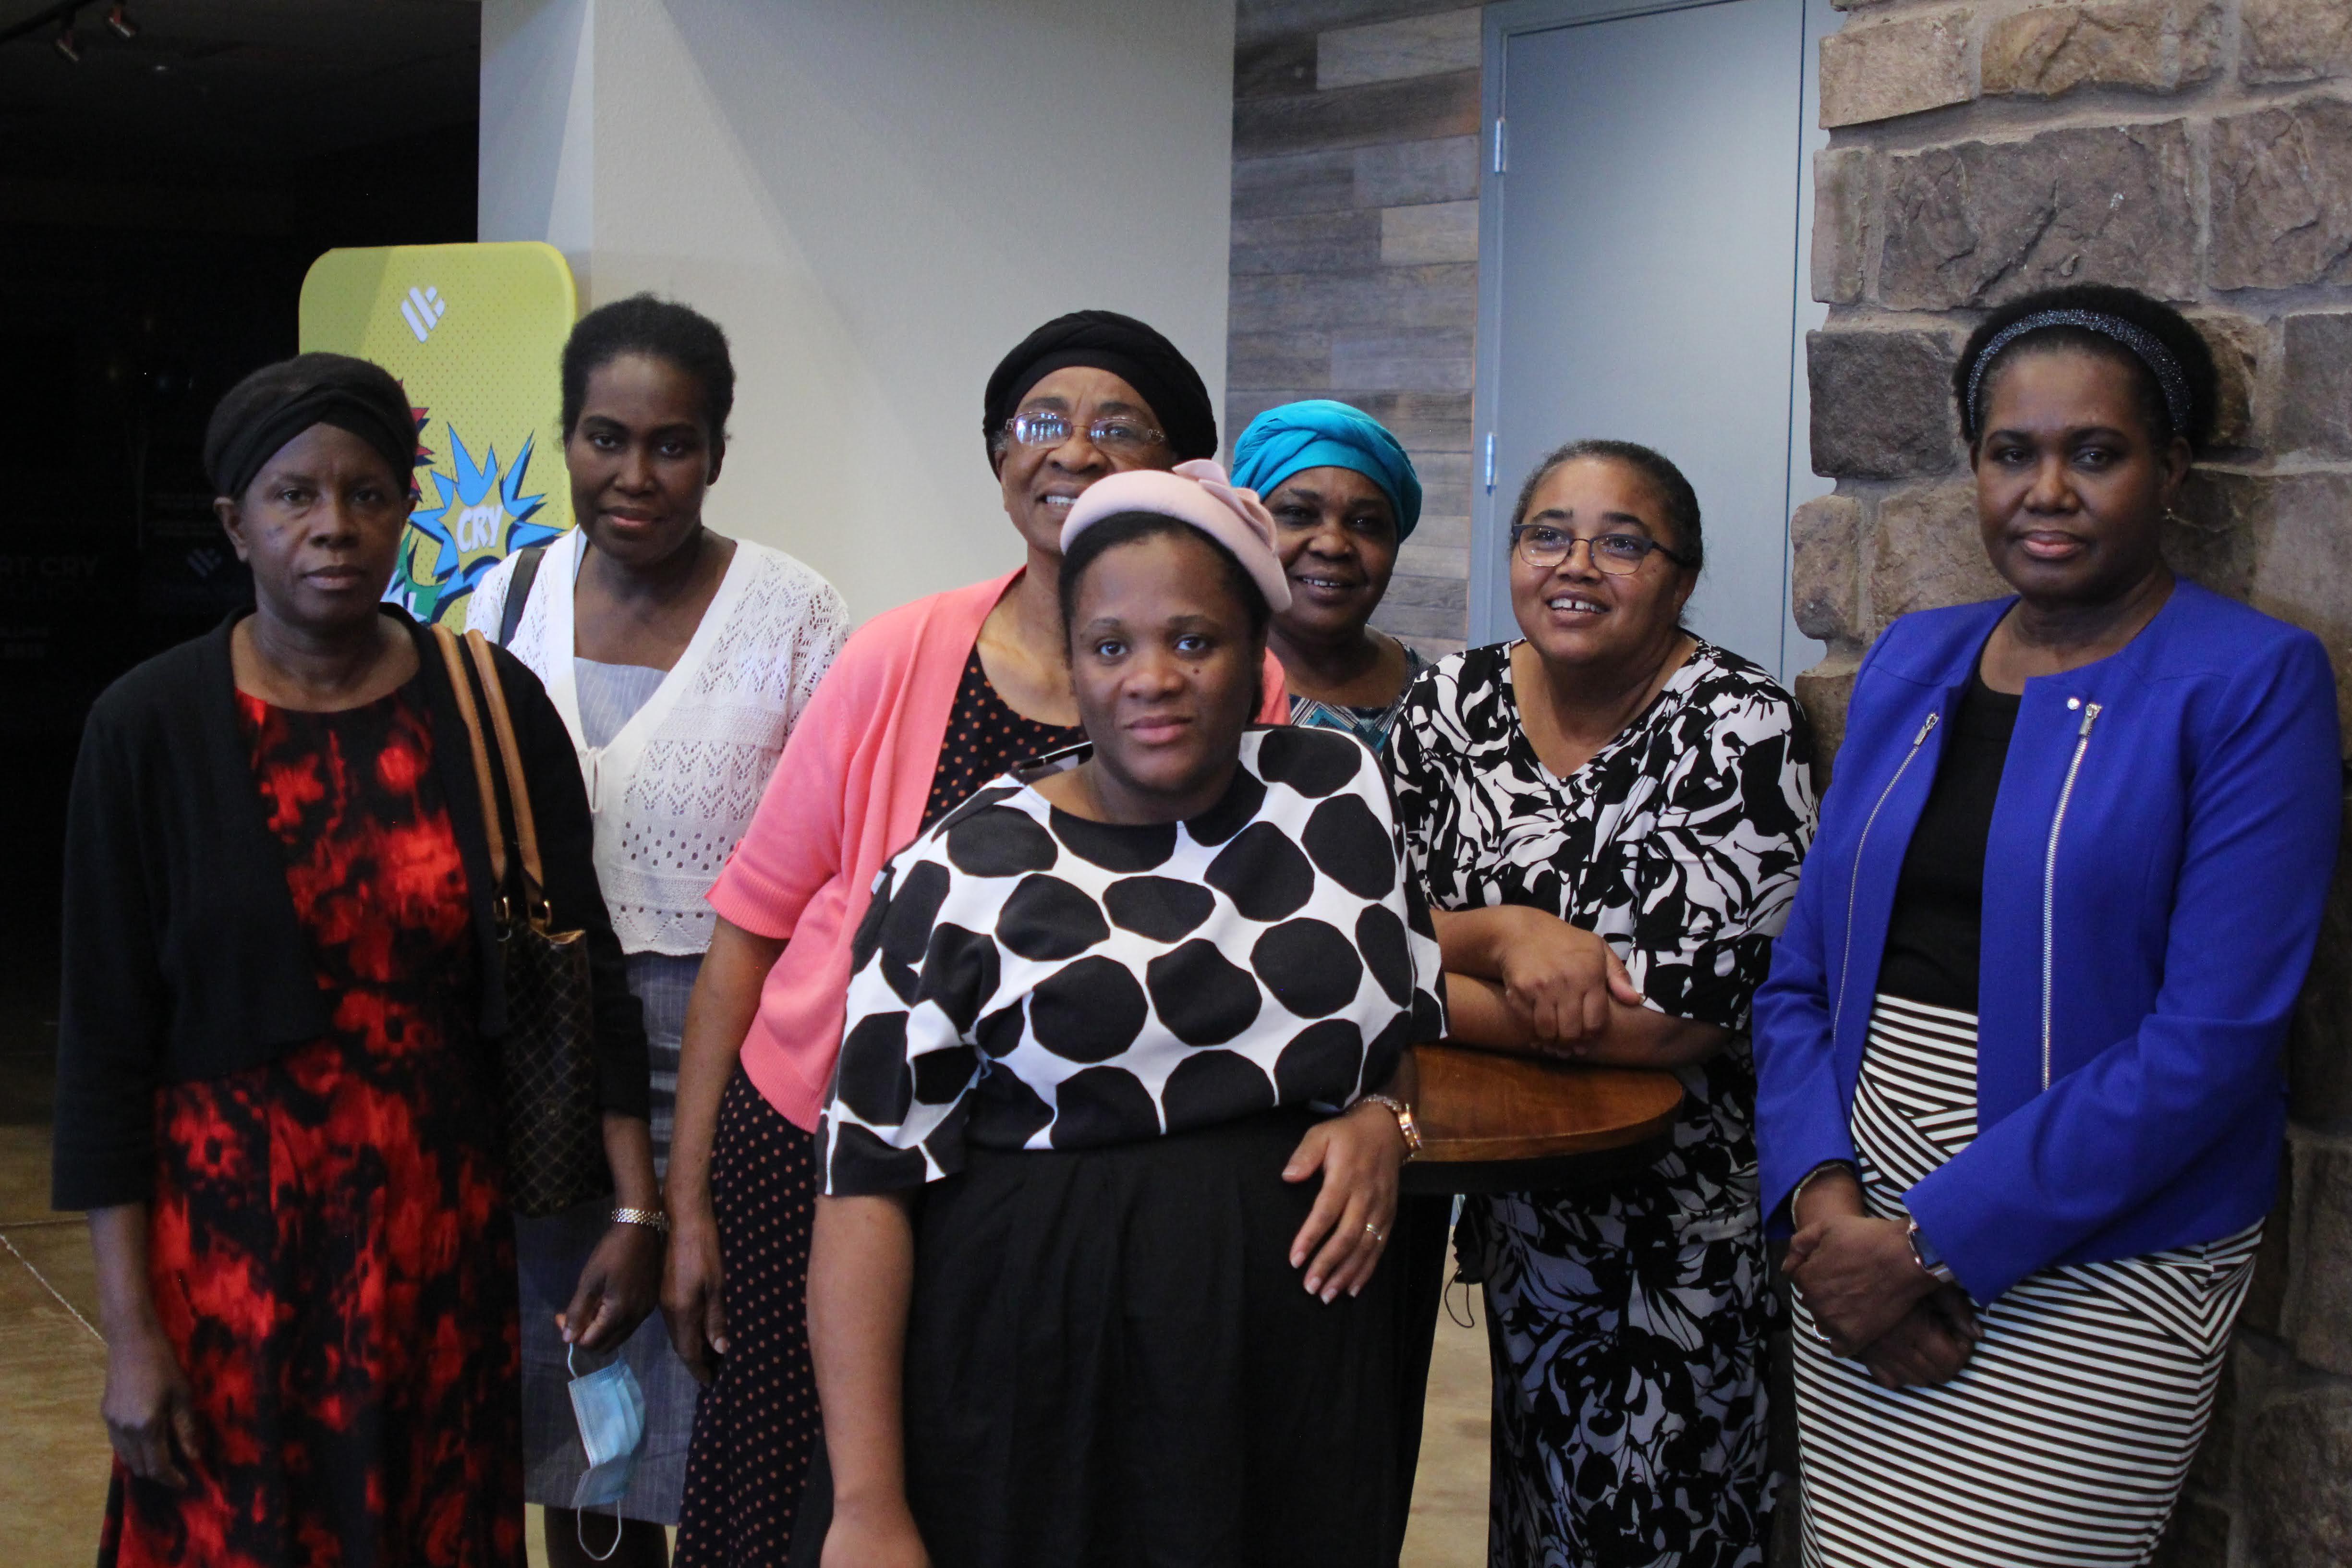 Women's ministry staff